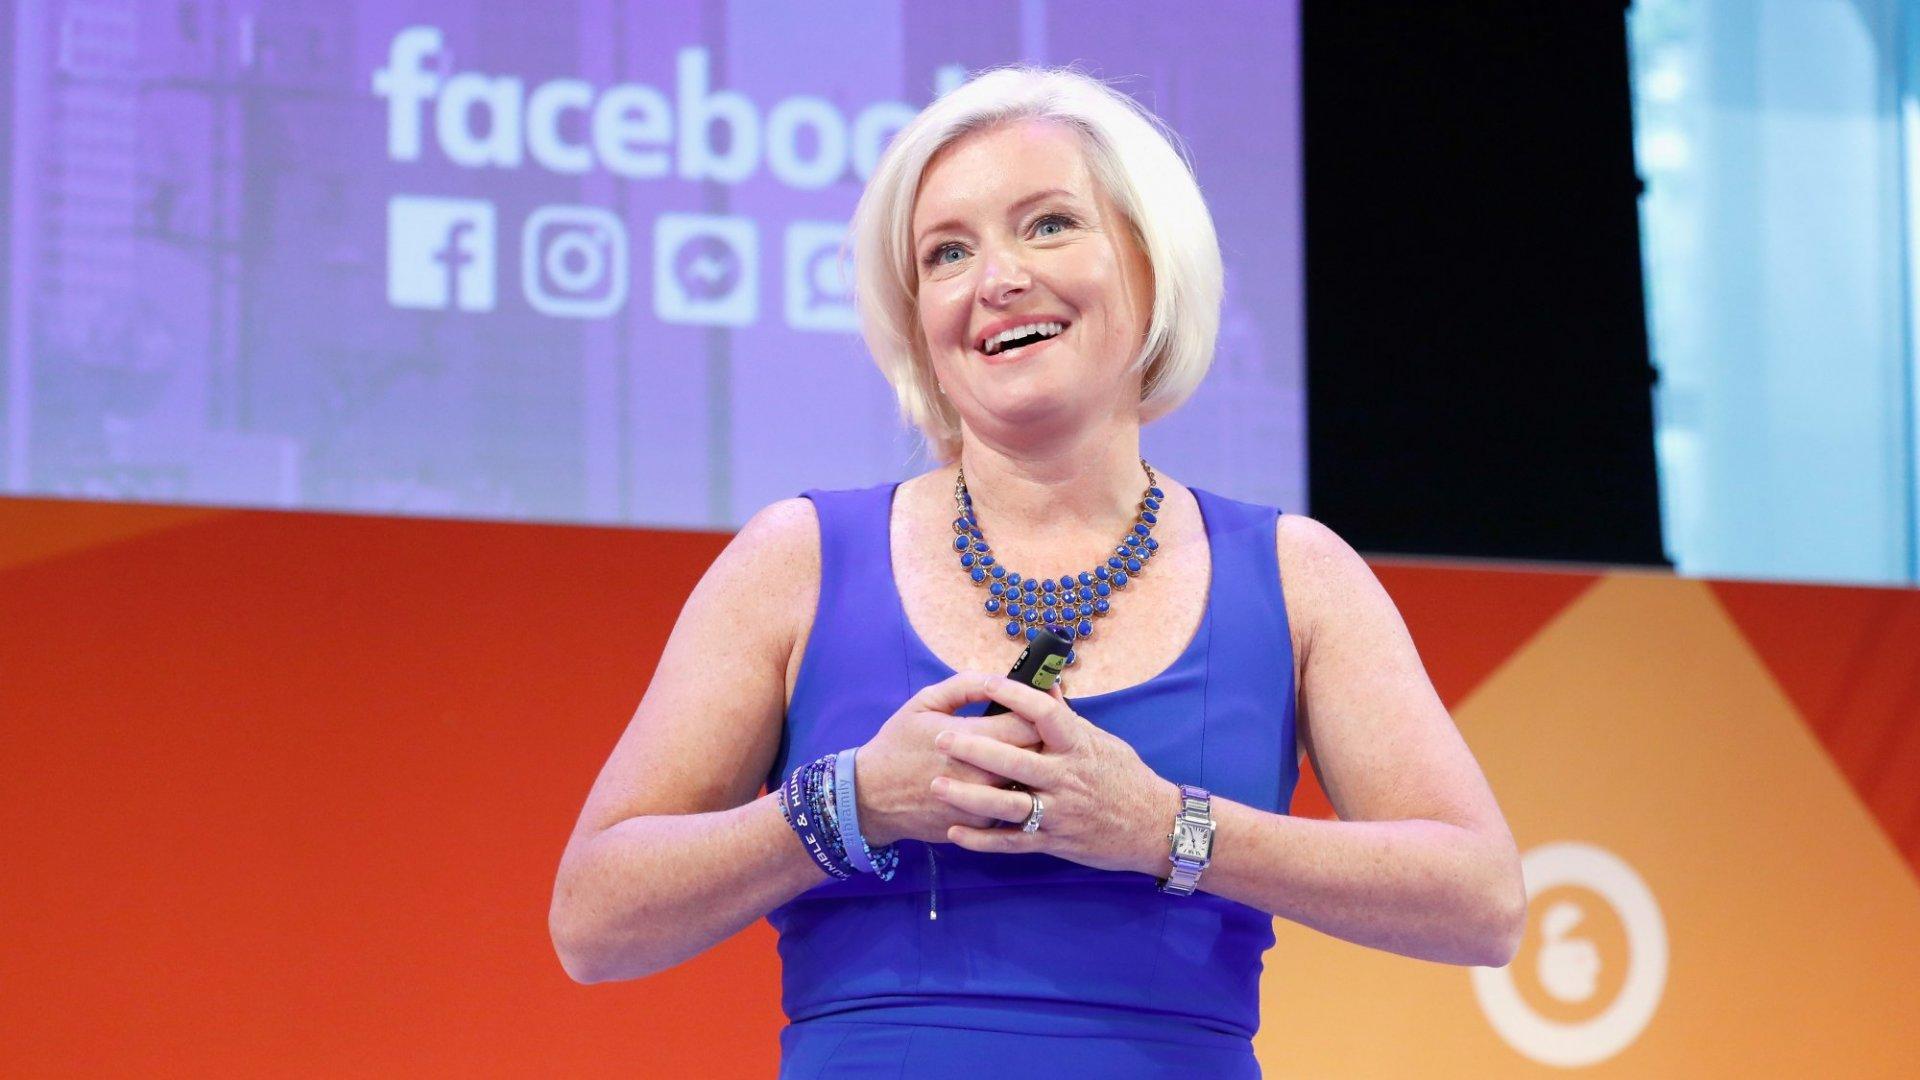 Facebook Admits It Exaggerated Ad Metrics